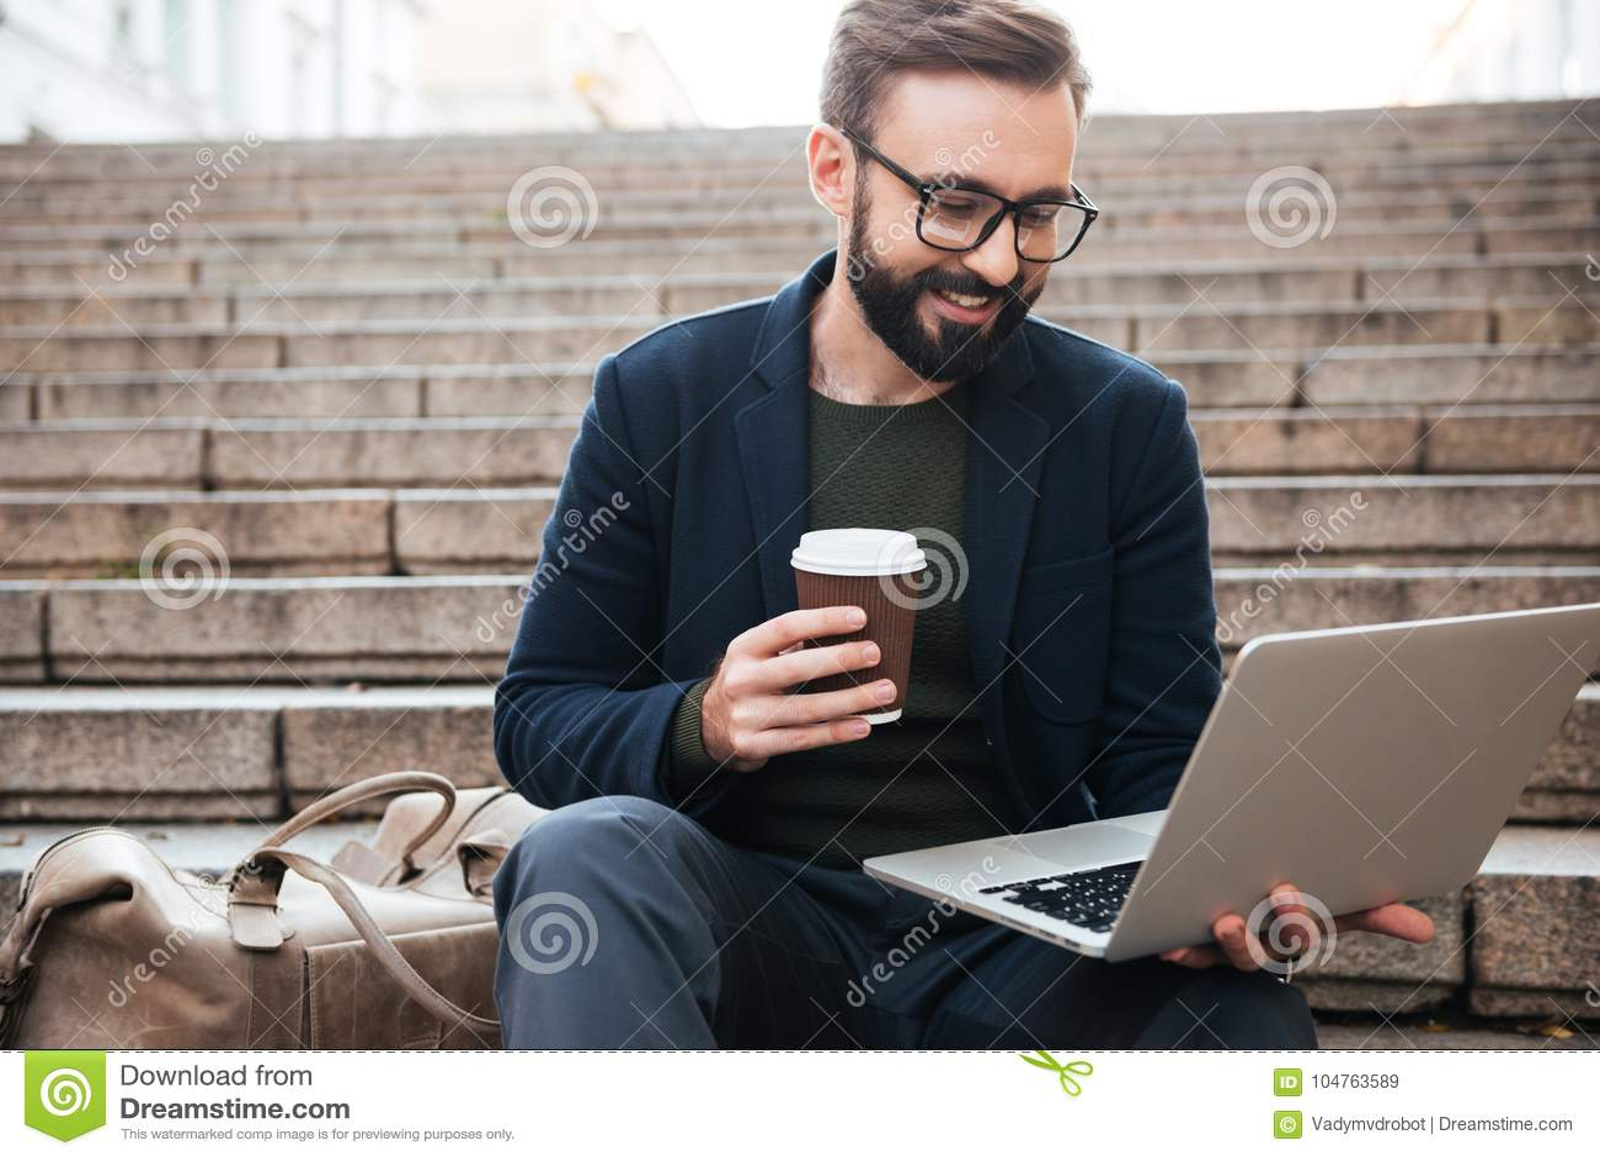 Portrait of a smiling handsome man in eyeglasses